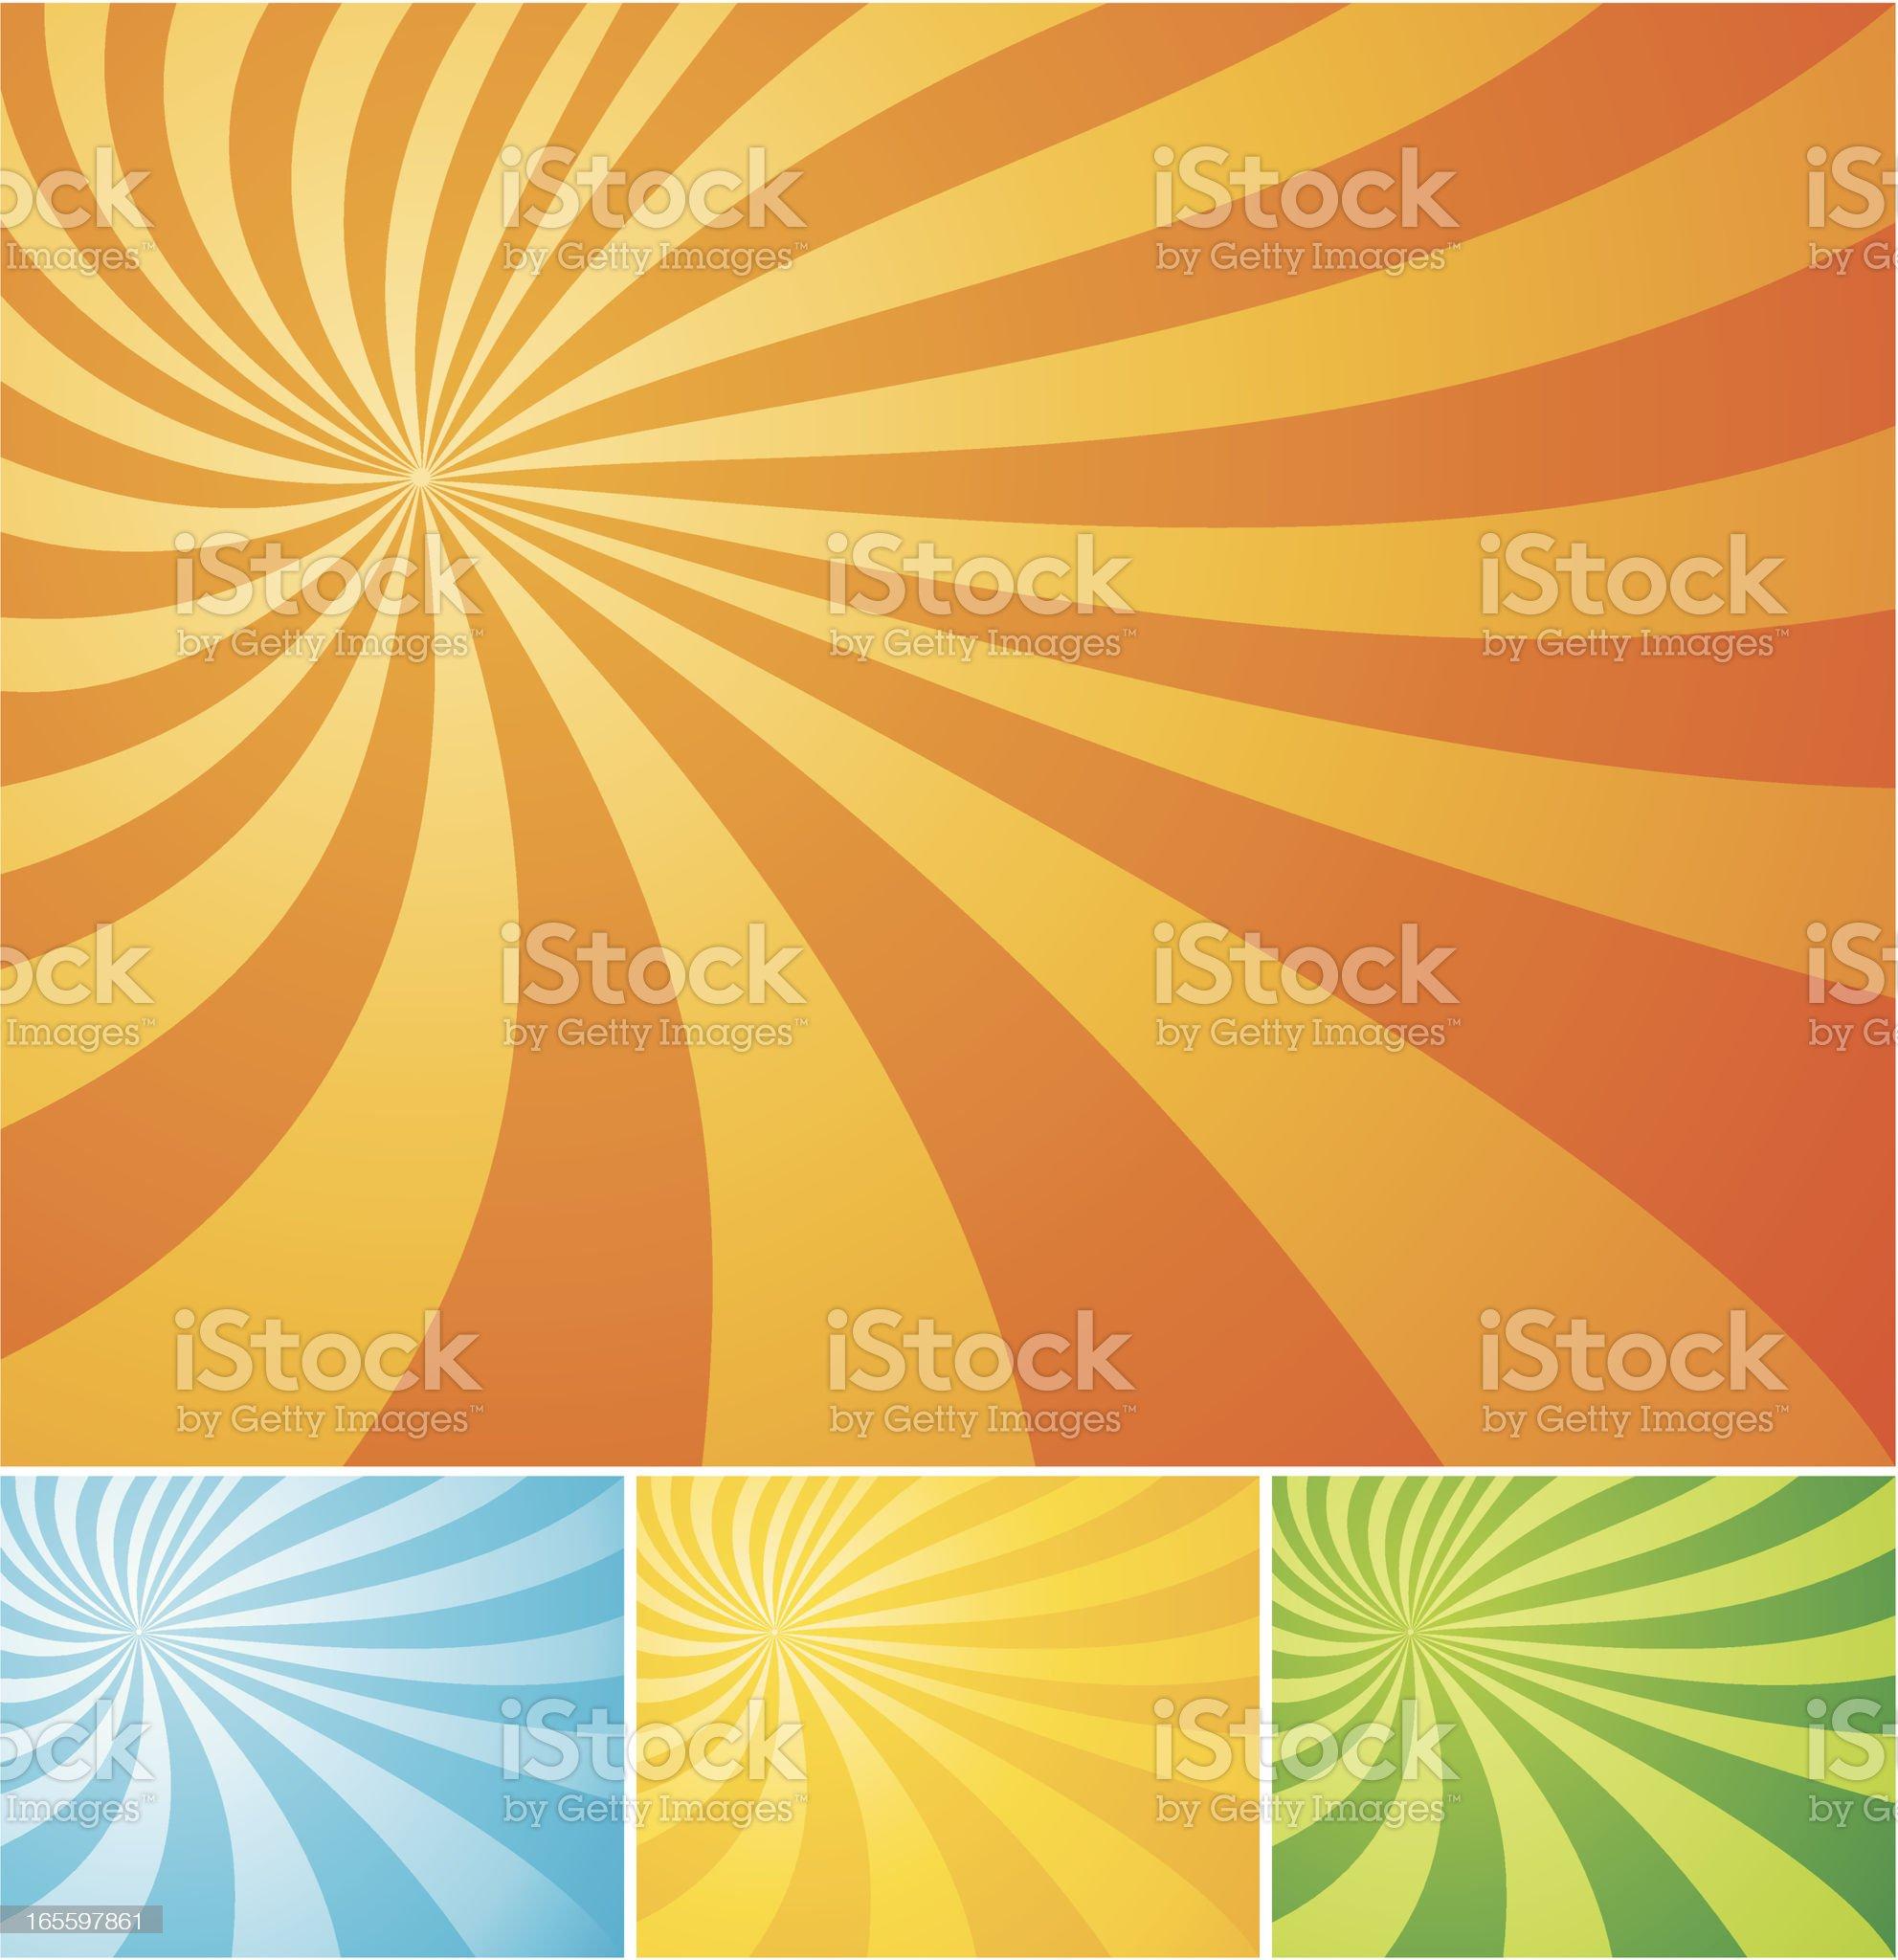 Sun Ray Swirl Background royalty-free stock vector art